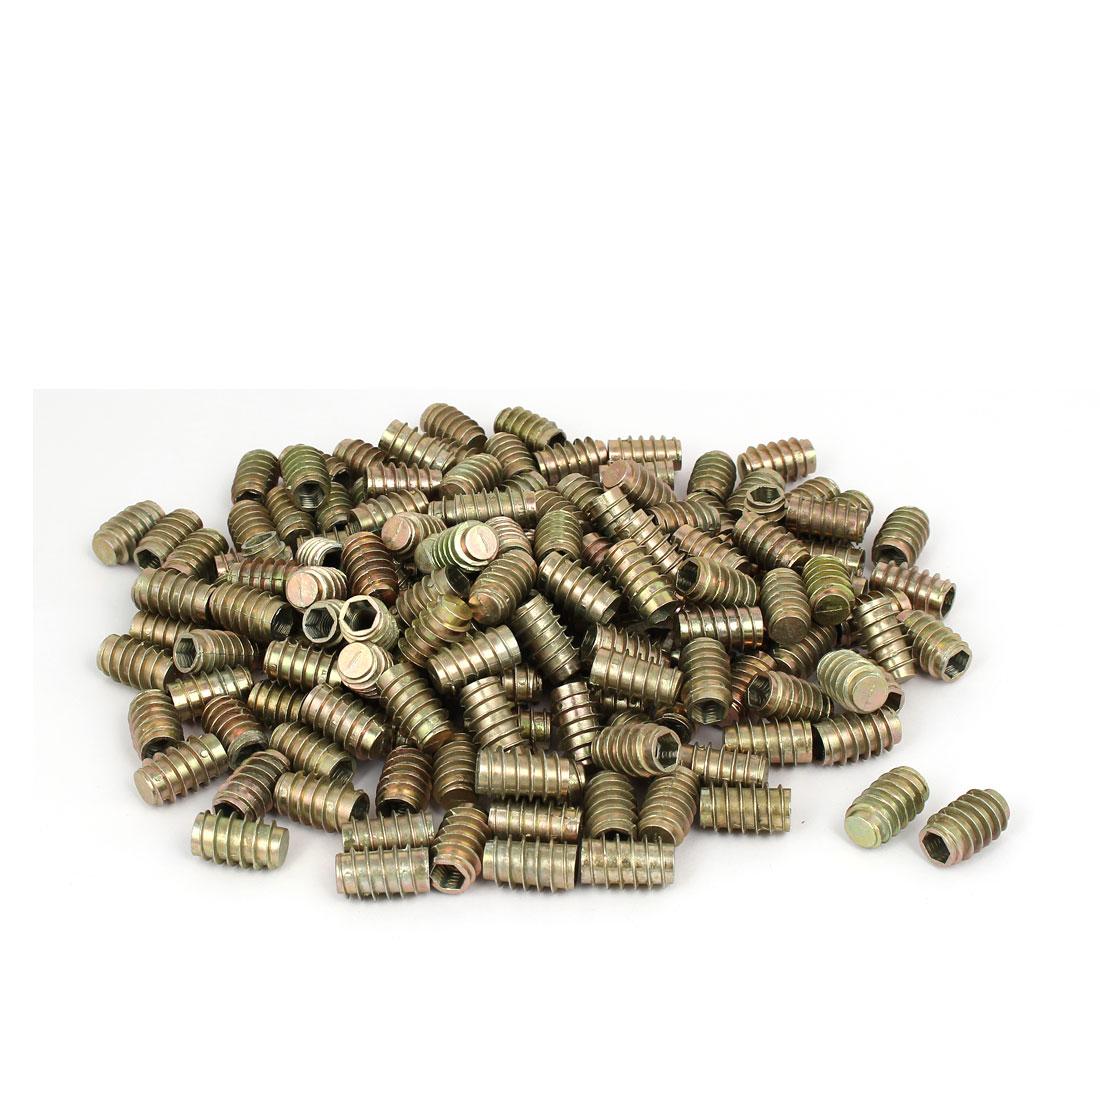 Furniture Zinc Alloy Blind Hole Hex Socket Insert Screws E-Nuts M8x25mm 200pcs